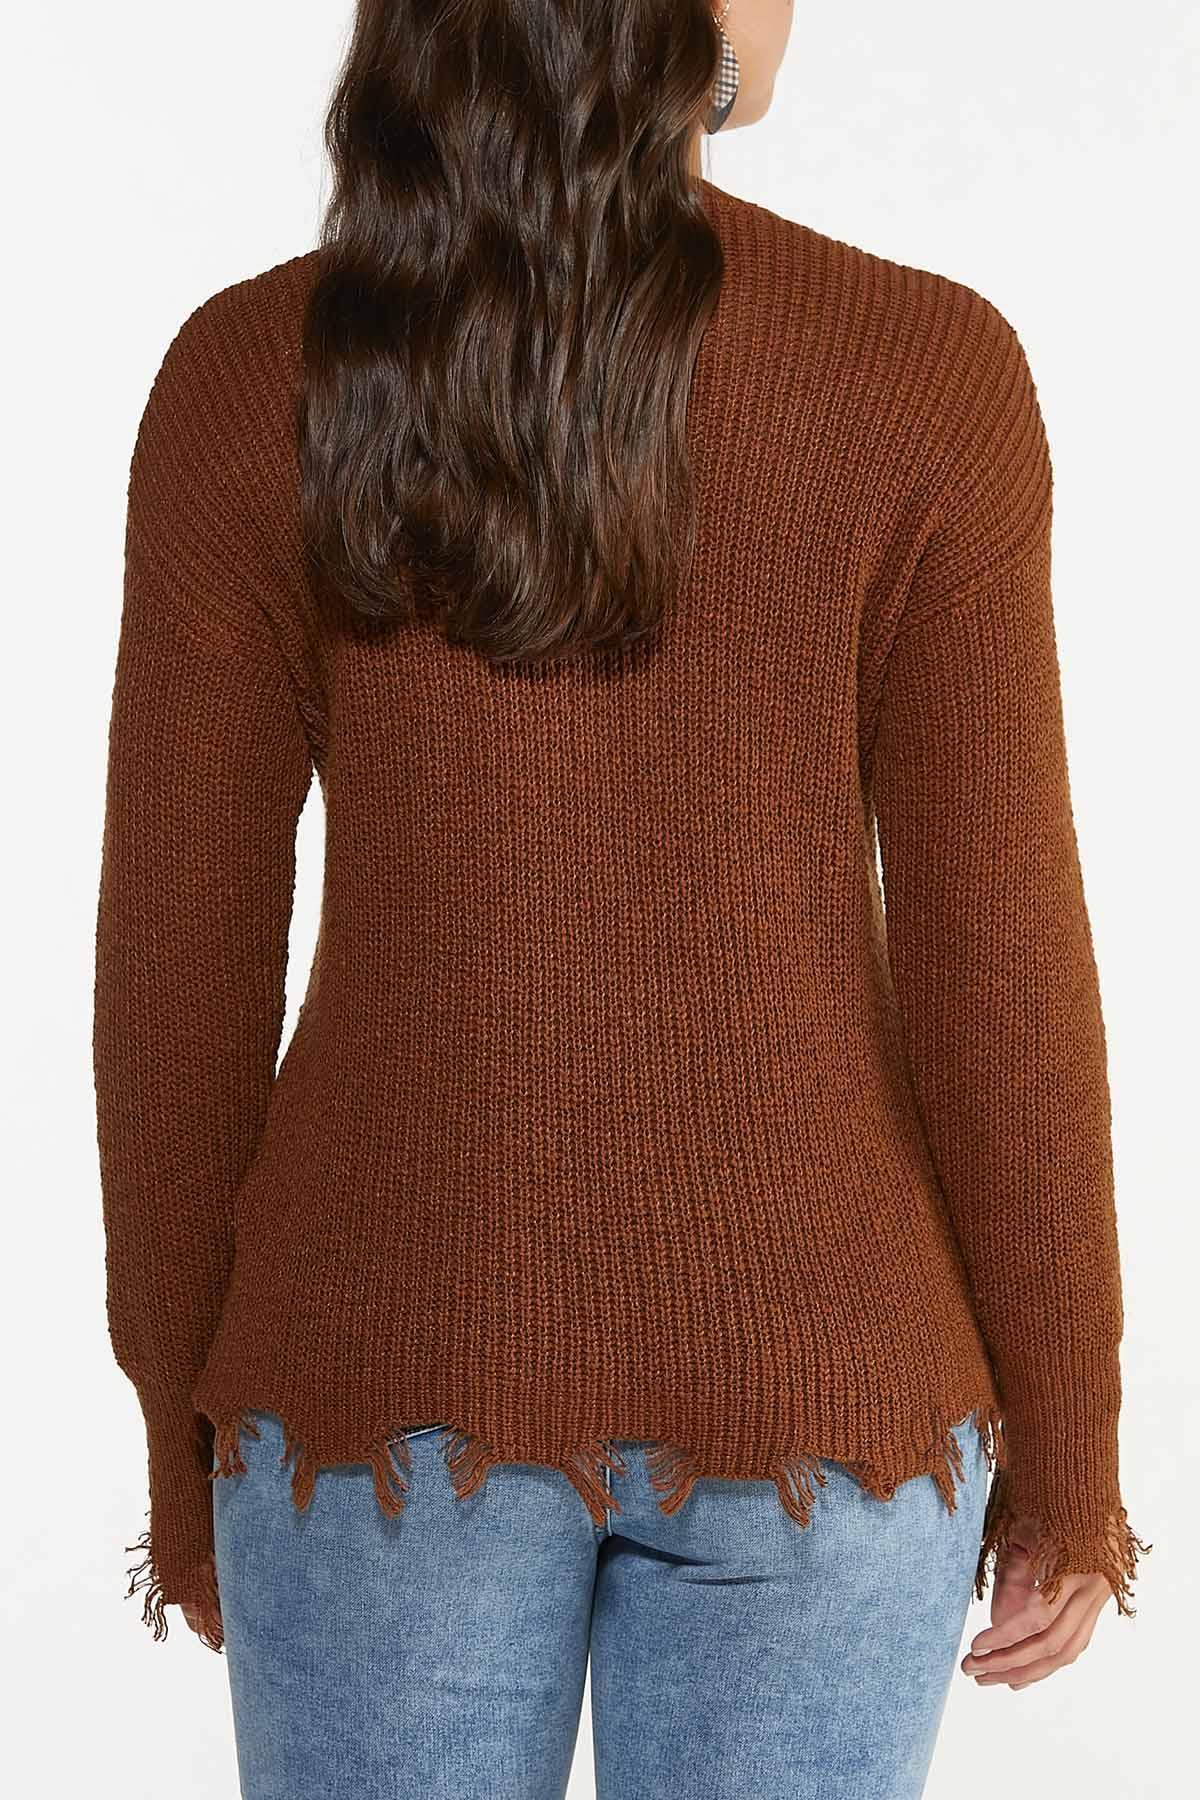 Disressed V-Neck Sweater (Item #44655982)